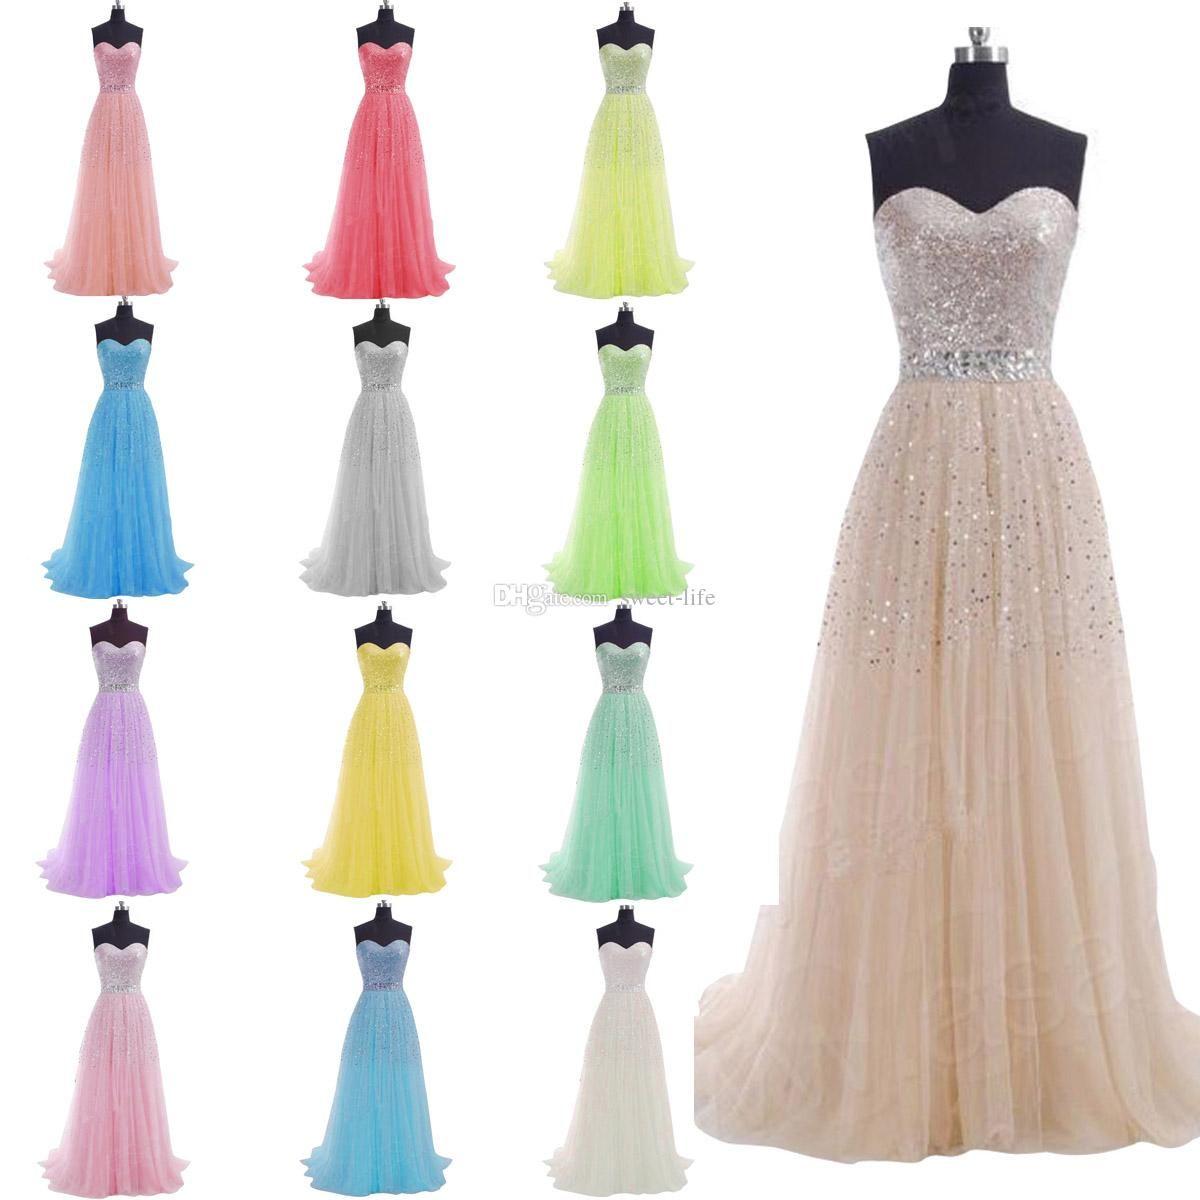 spring prom dresses light sky blue backless appliques sexy